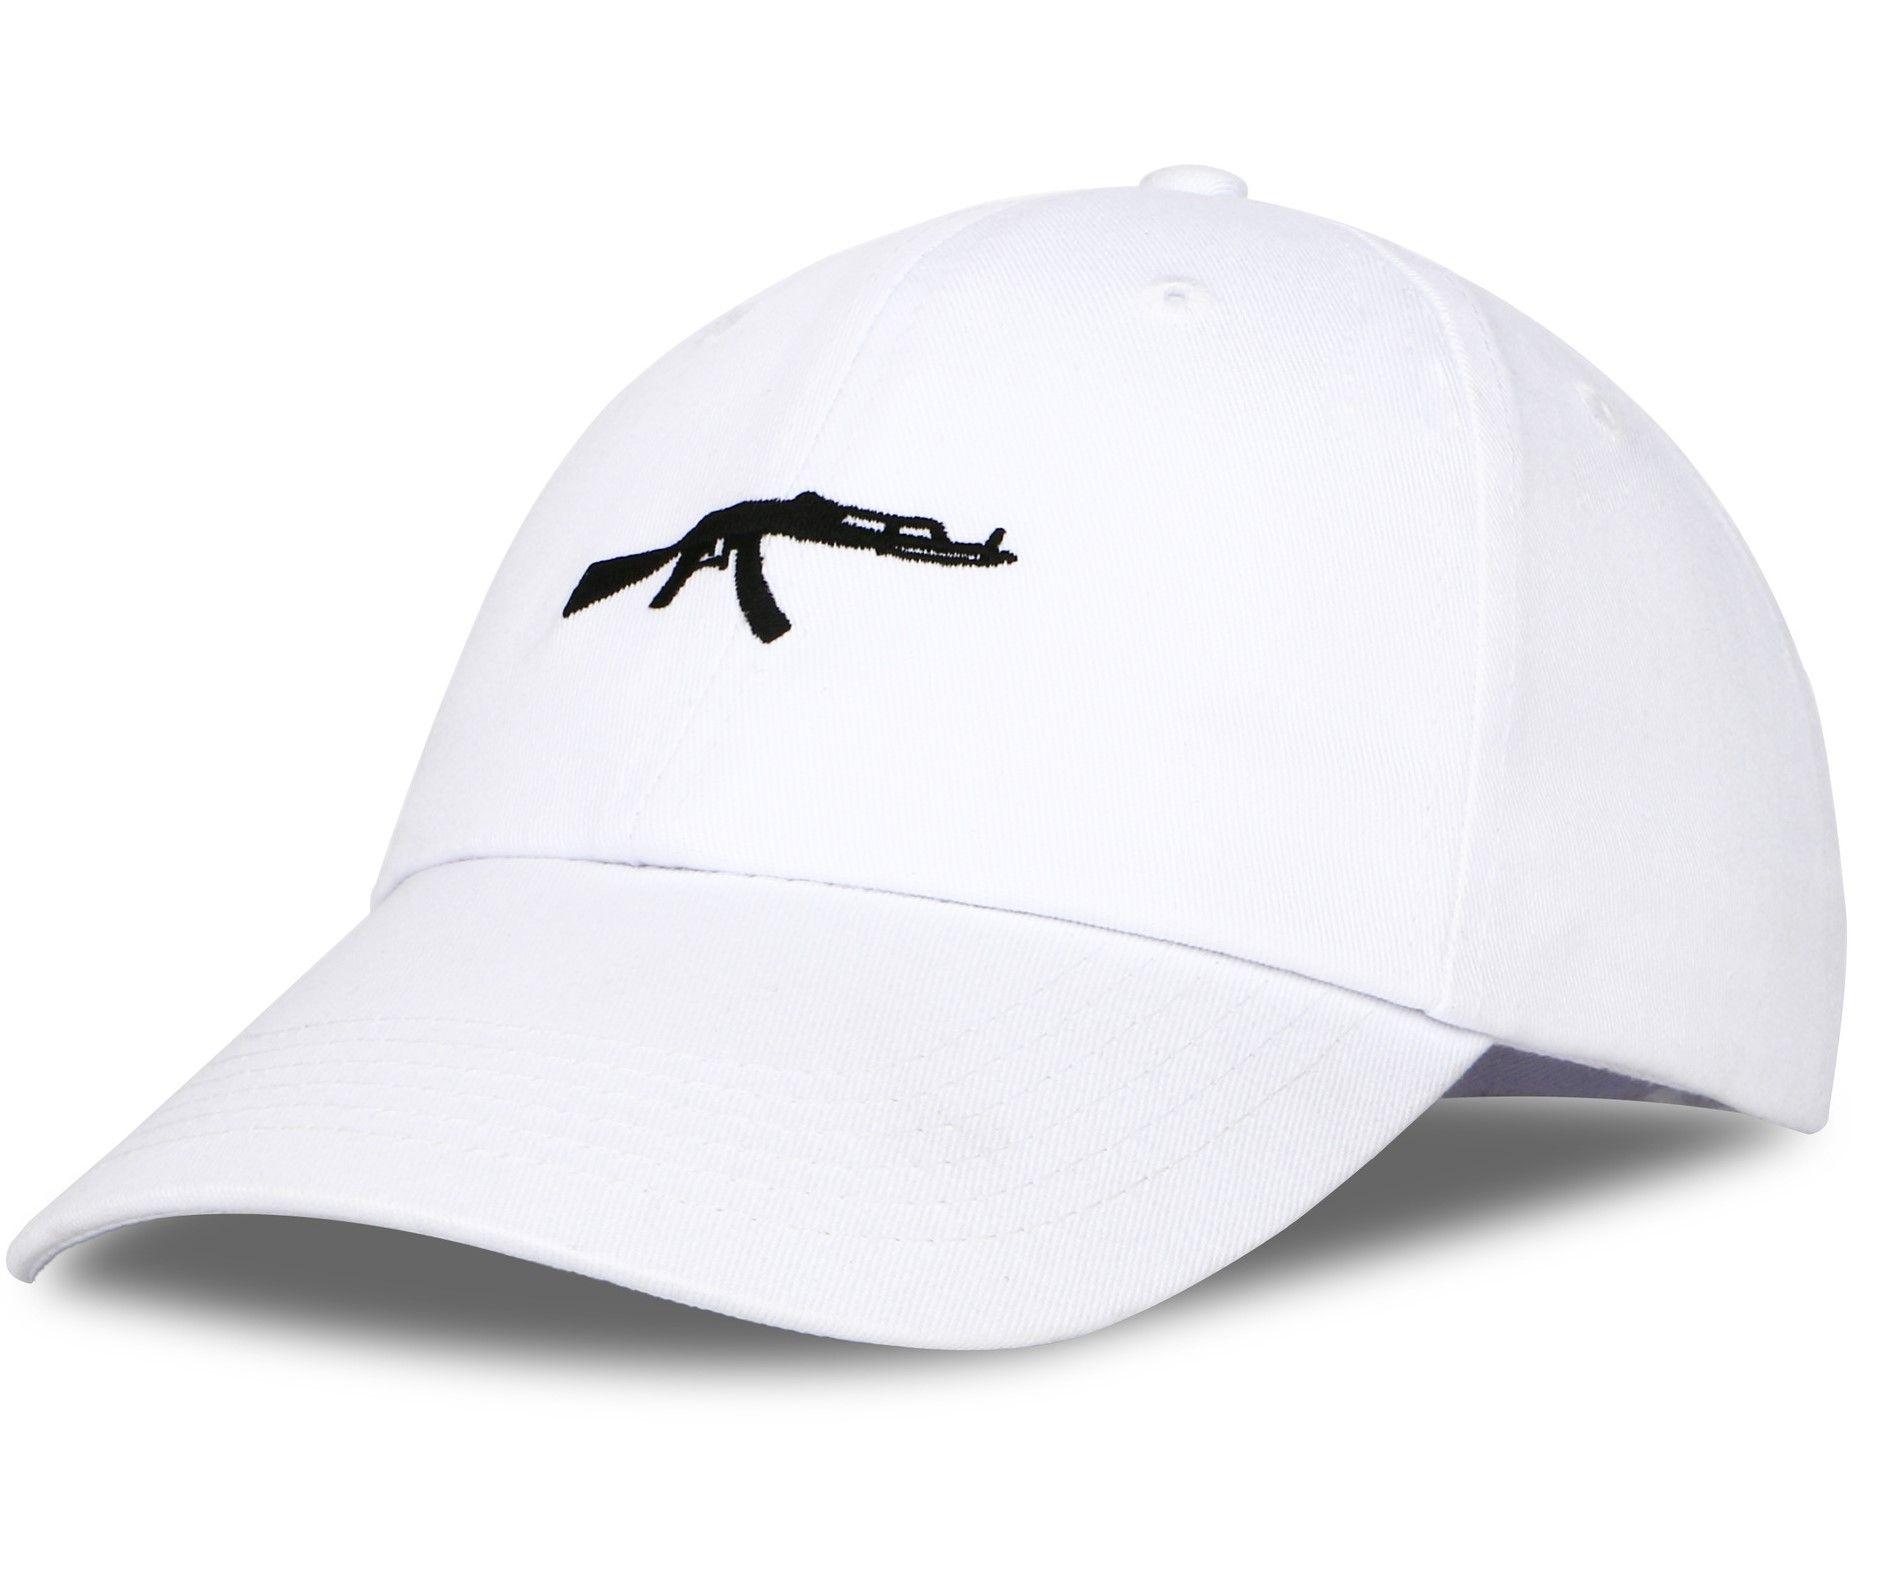 28b05ebc5ab Hot Pistol Machine Gun AK47 Baseball Fashion Cap Male Sun Hat Sun Hat Gun AK47  Baseball Cap Online with  9.83 Piece on Topfashionhub s Store